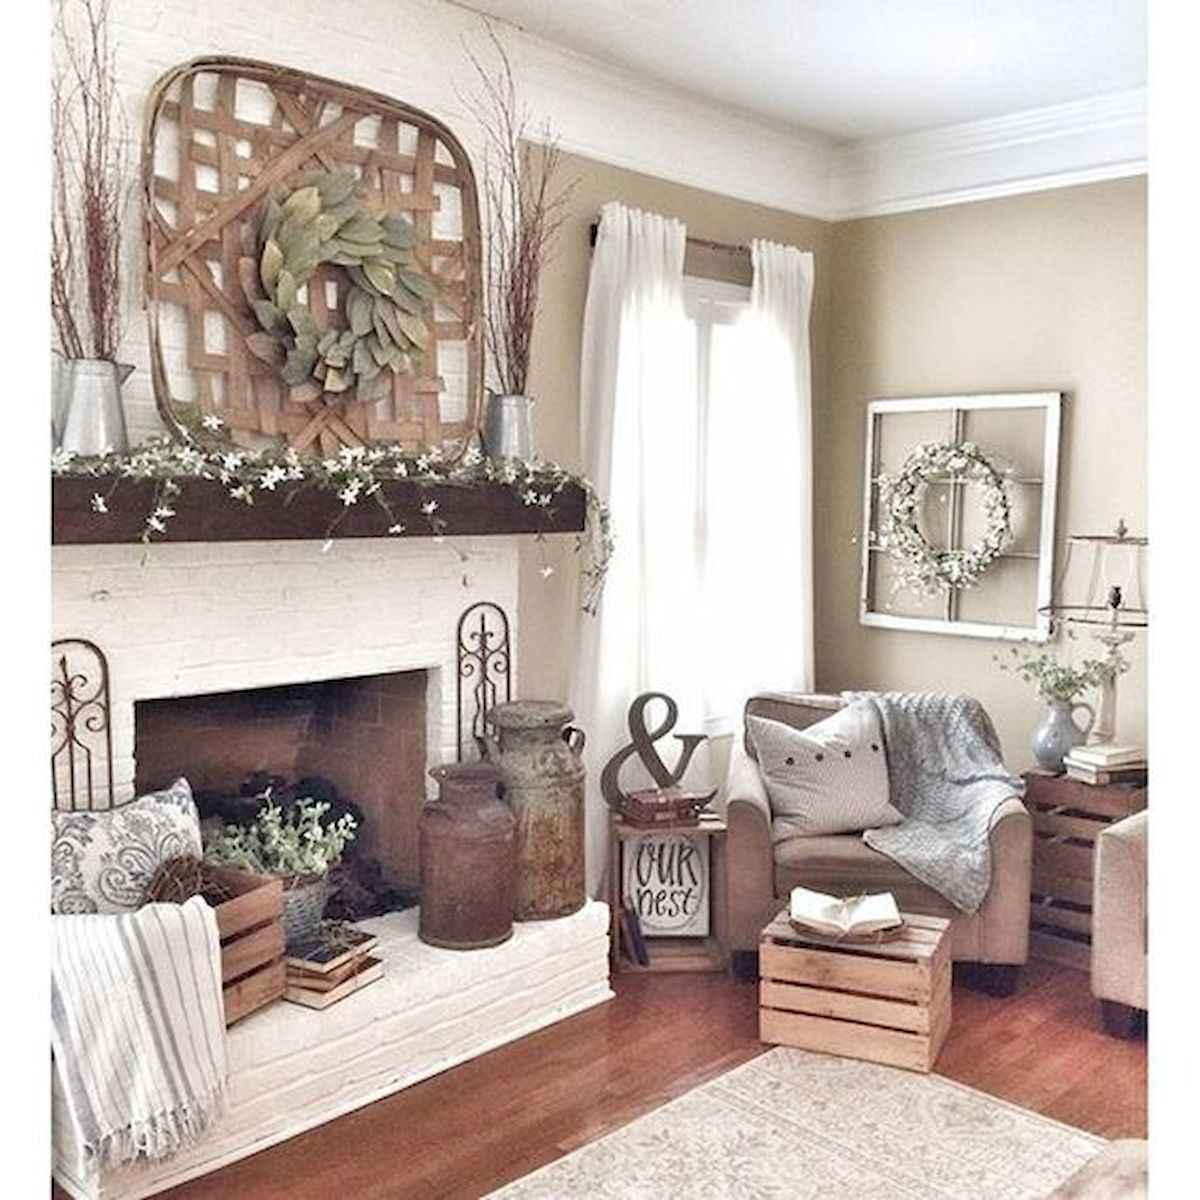 40 Awesome Fireplace Makeover For Farmhouse Home Decor (14)